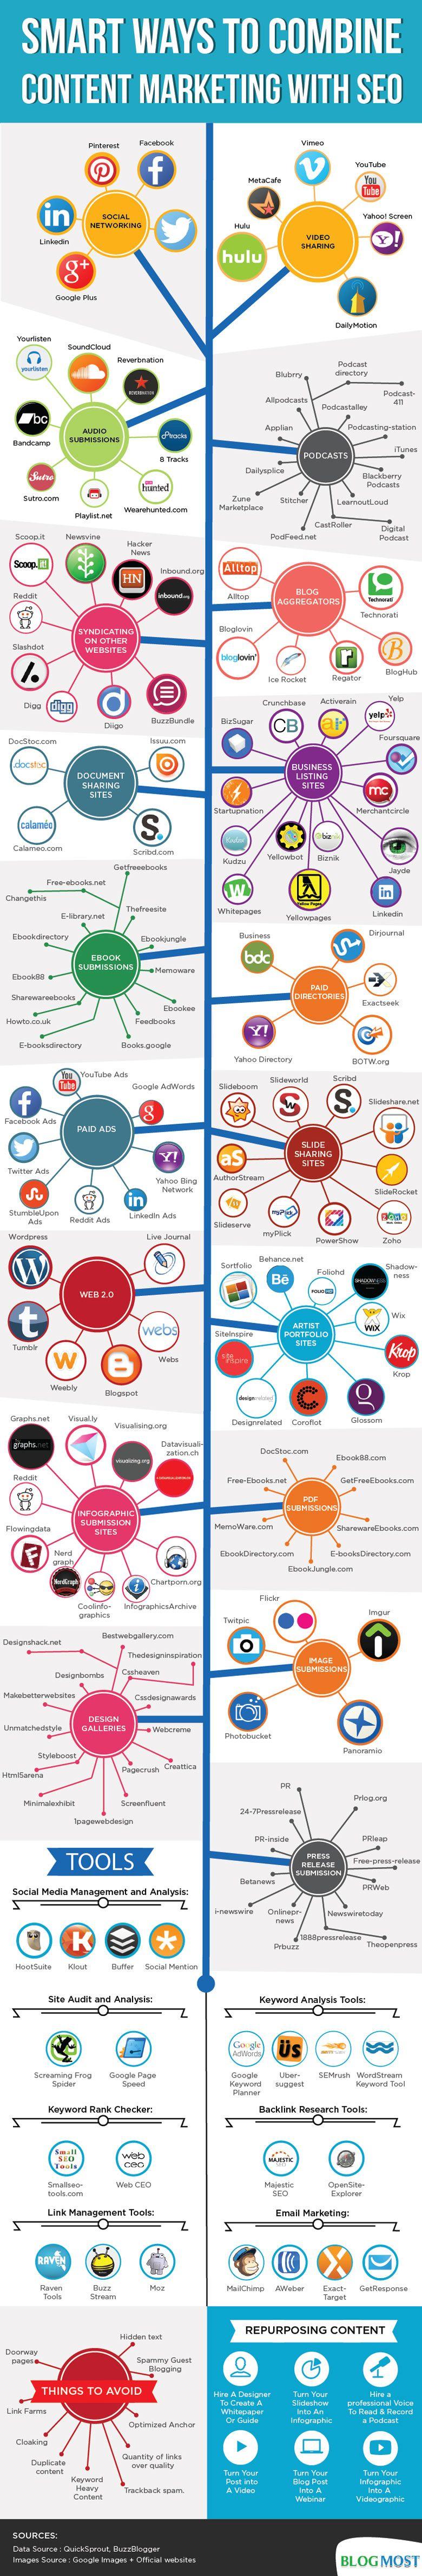 Combine Content Marketing with SEO in 2014 - http://hosting.ber-art.nl/combine-content-marketing-seo via @BerriePelser #socialmedia